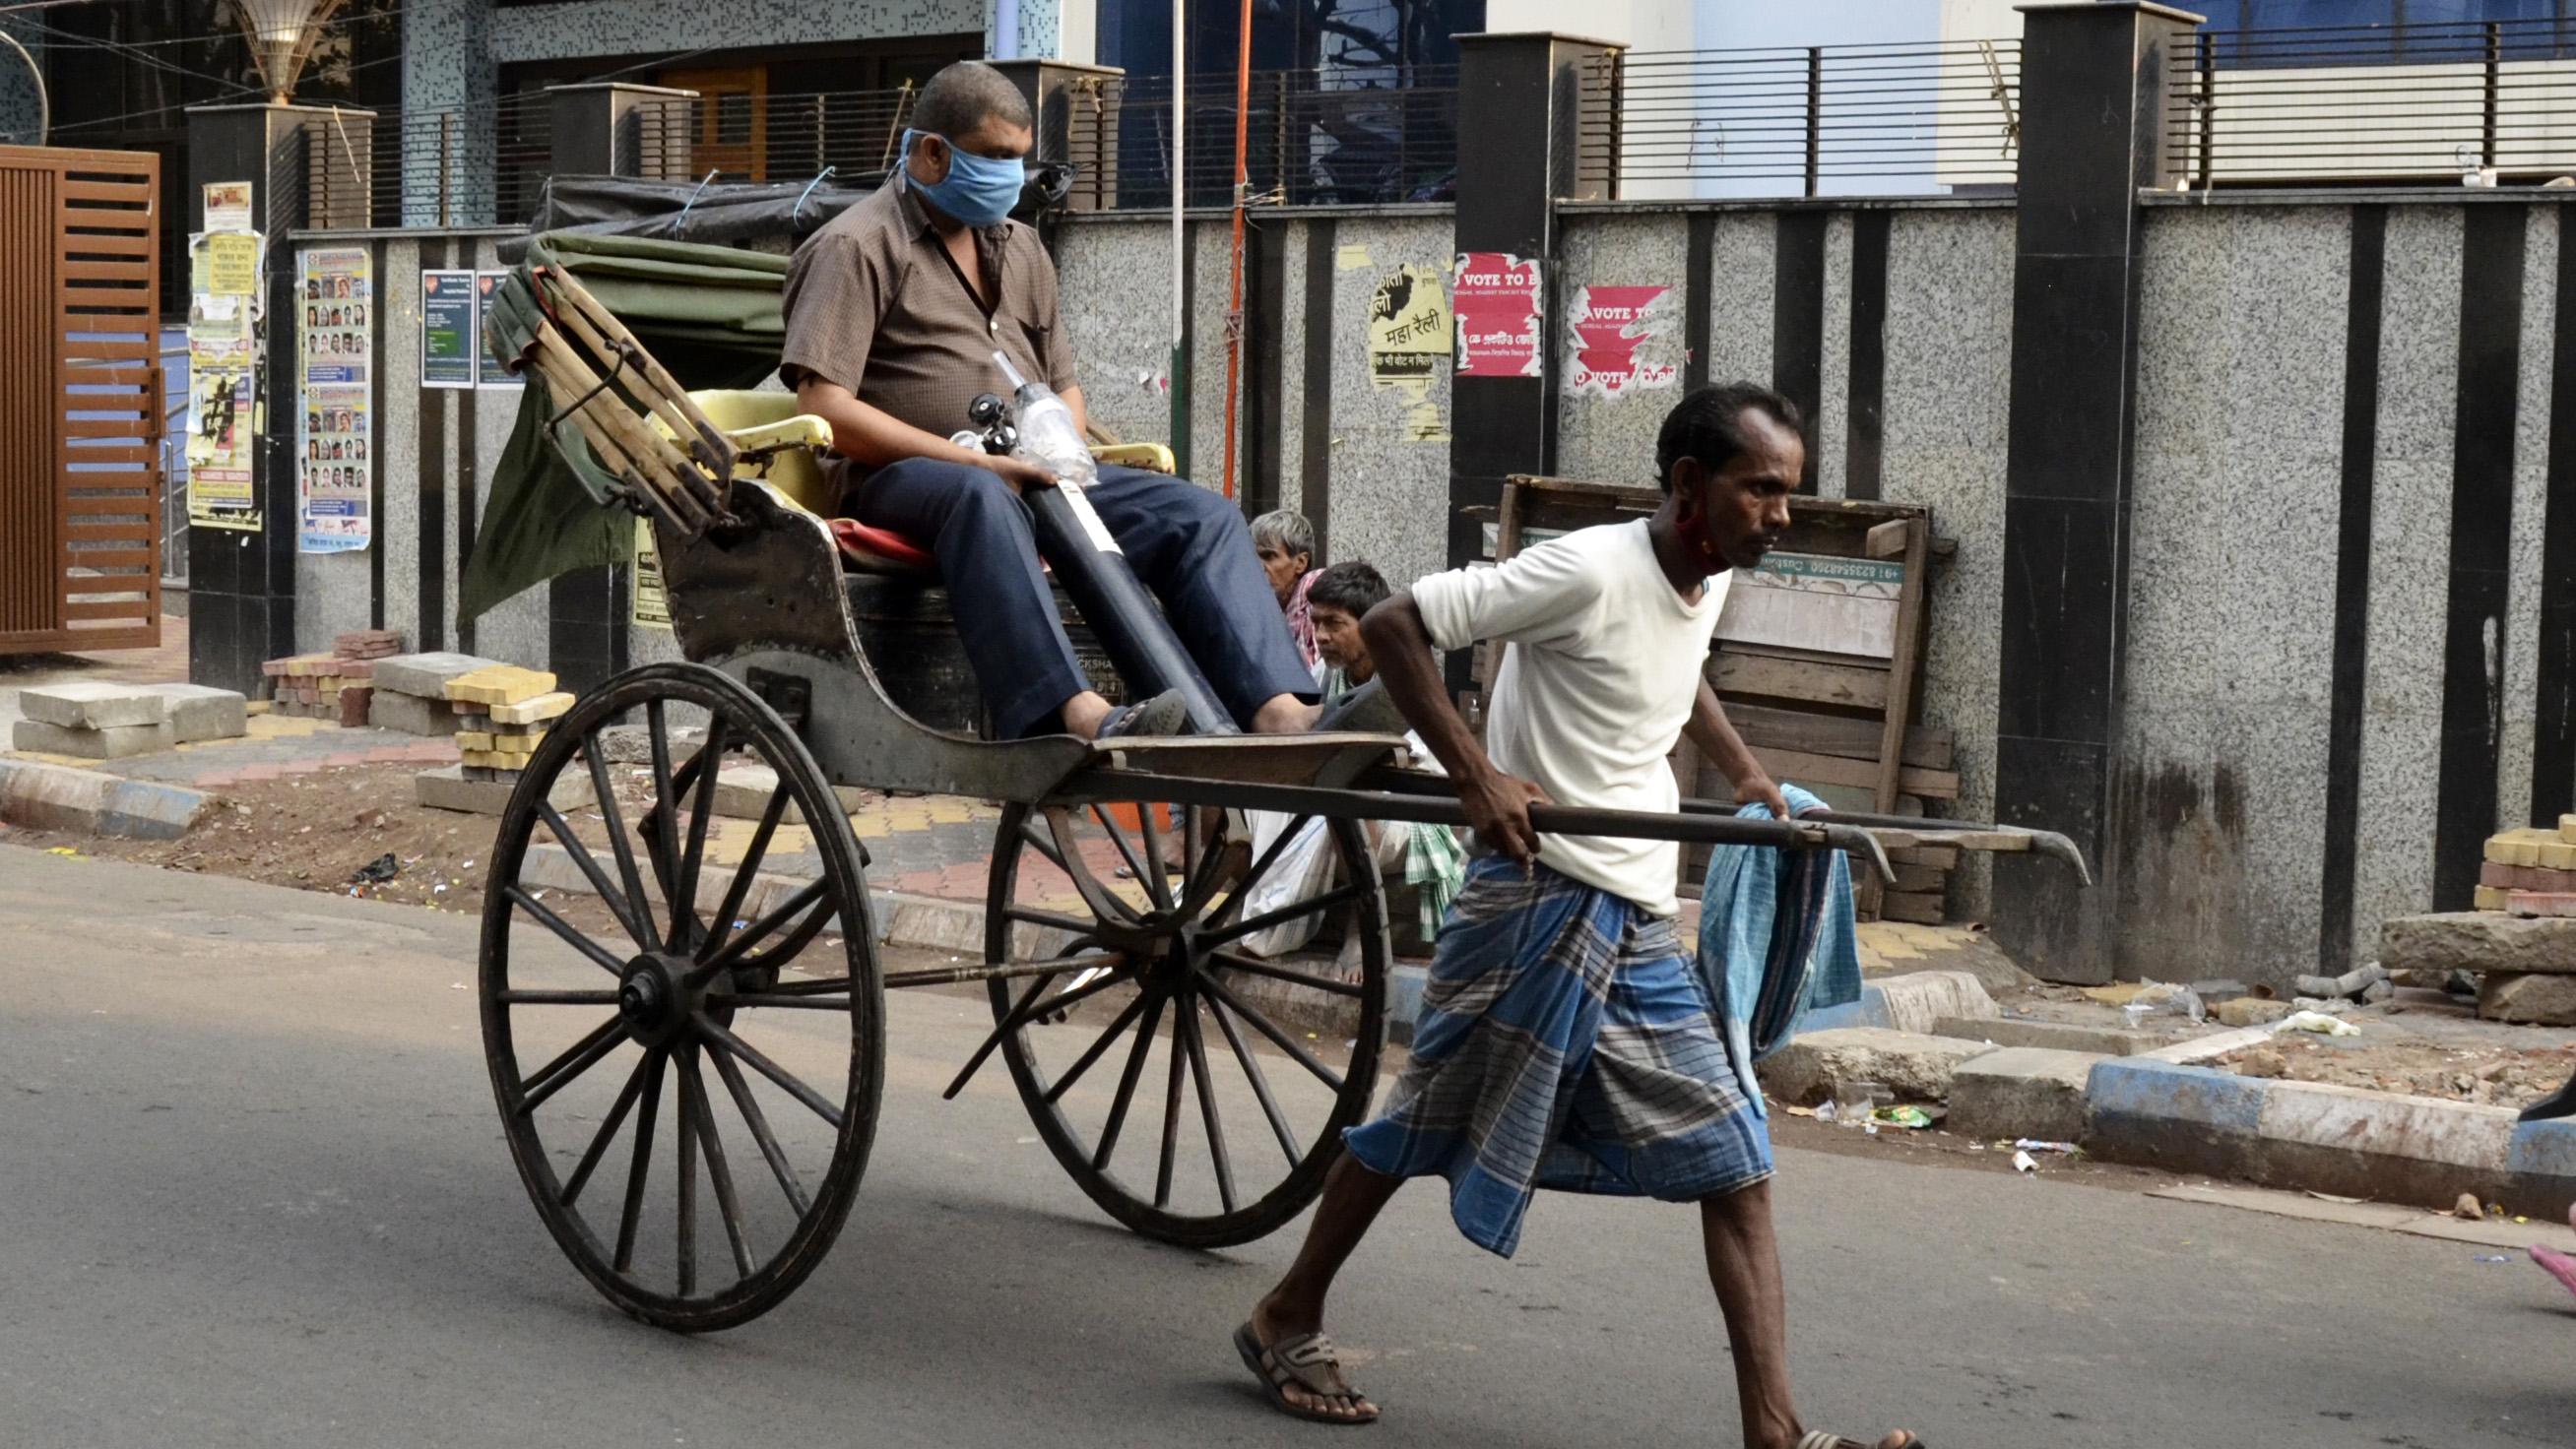 Devastation grows crematoriums overflow in India